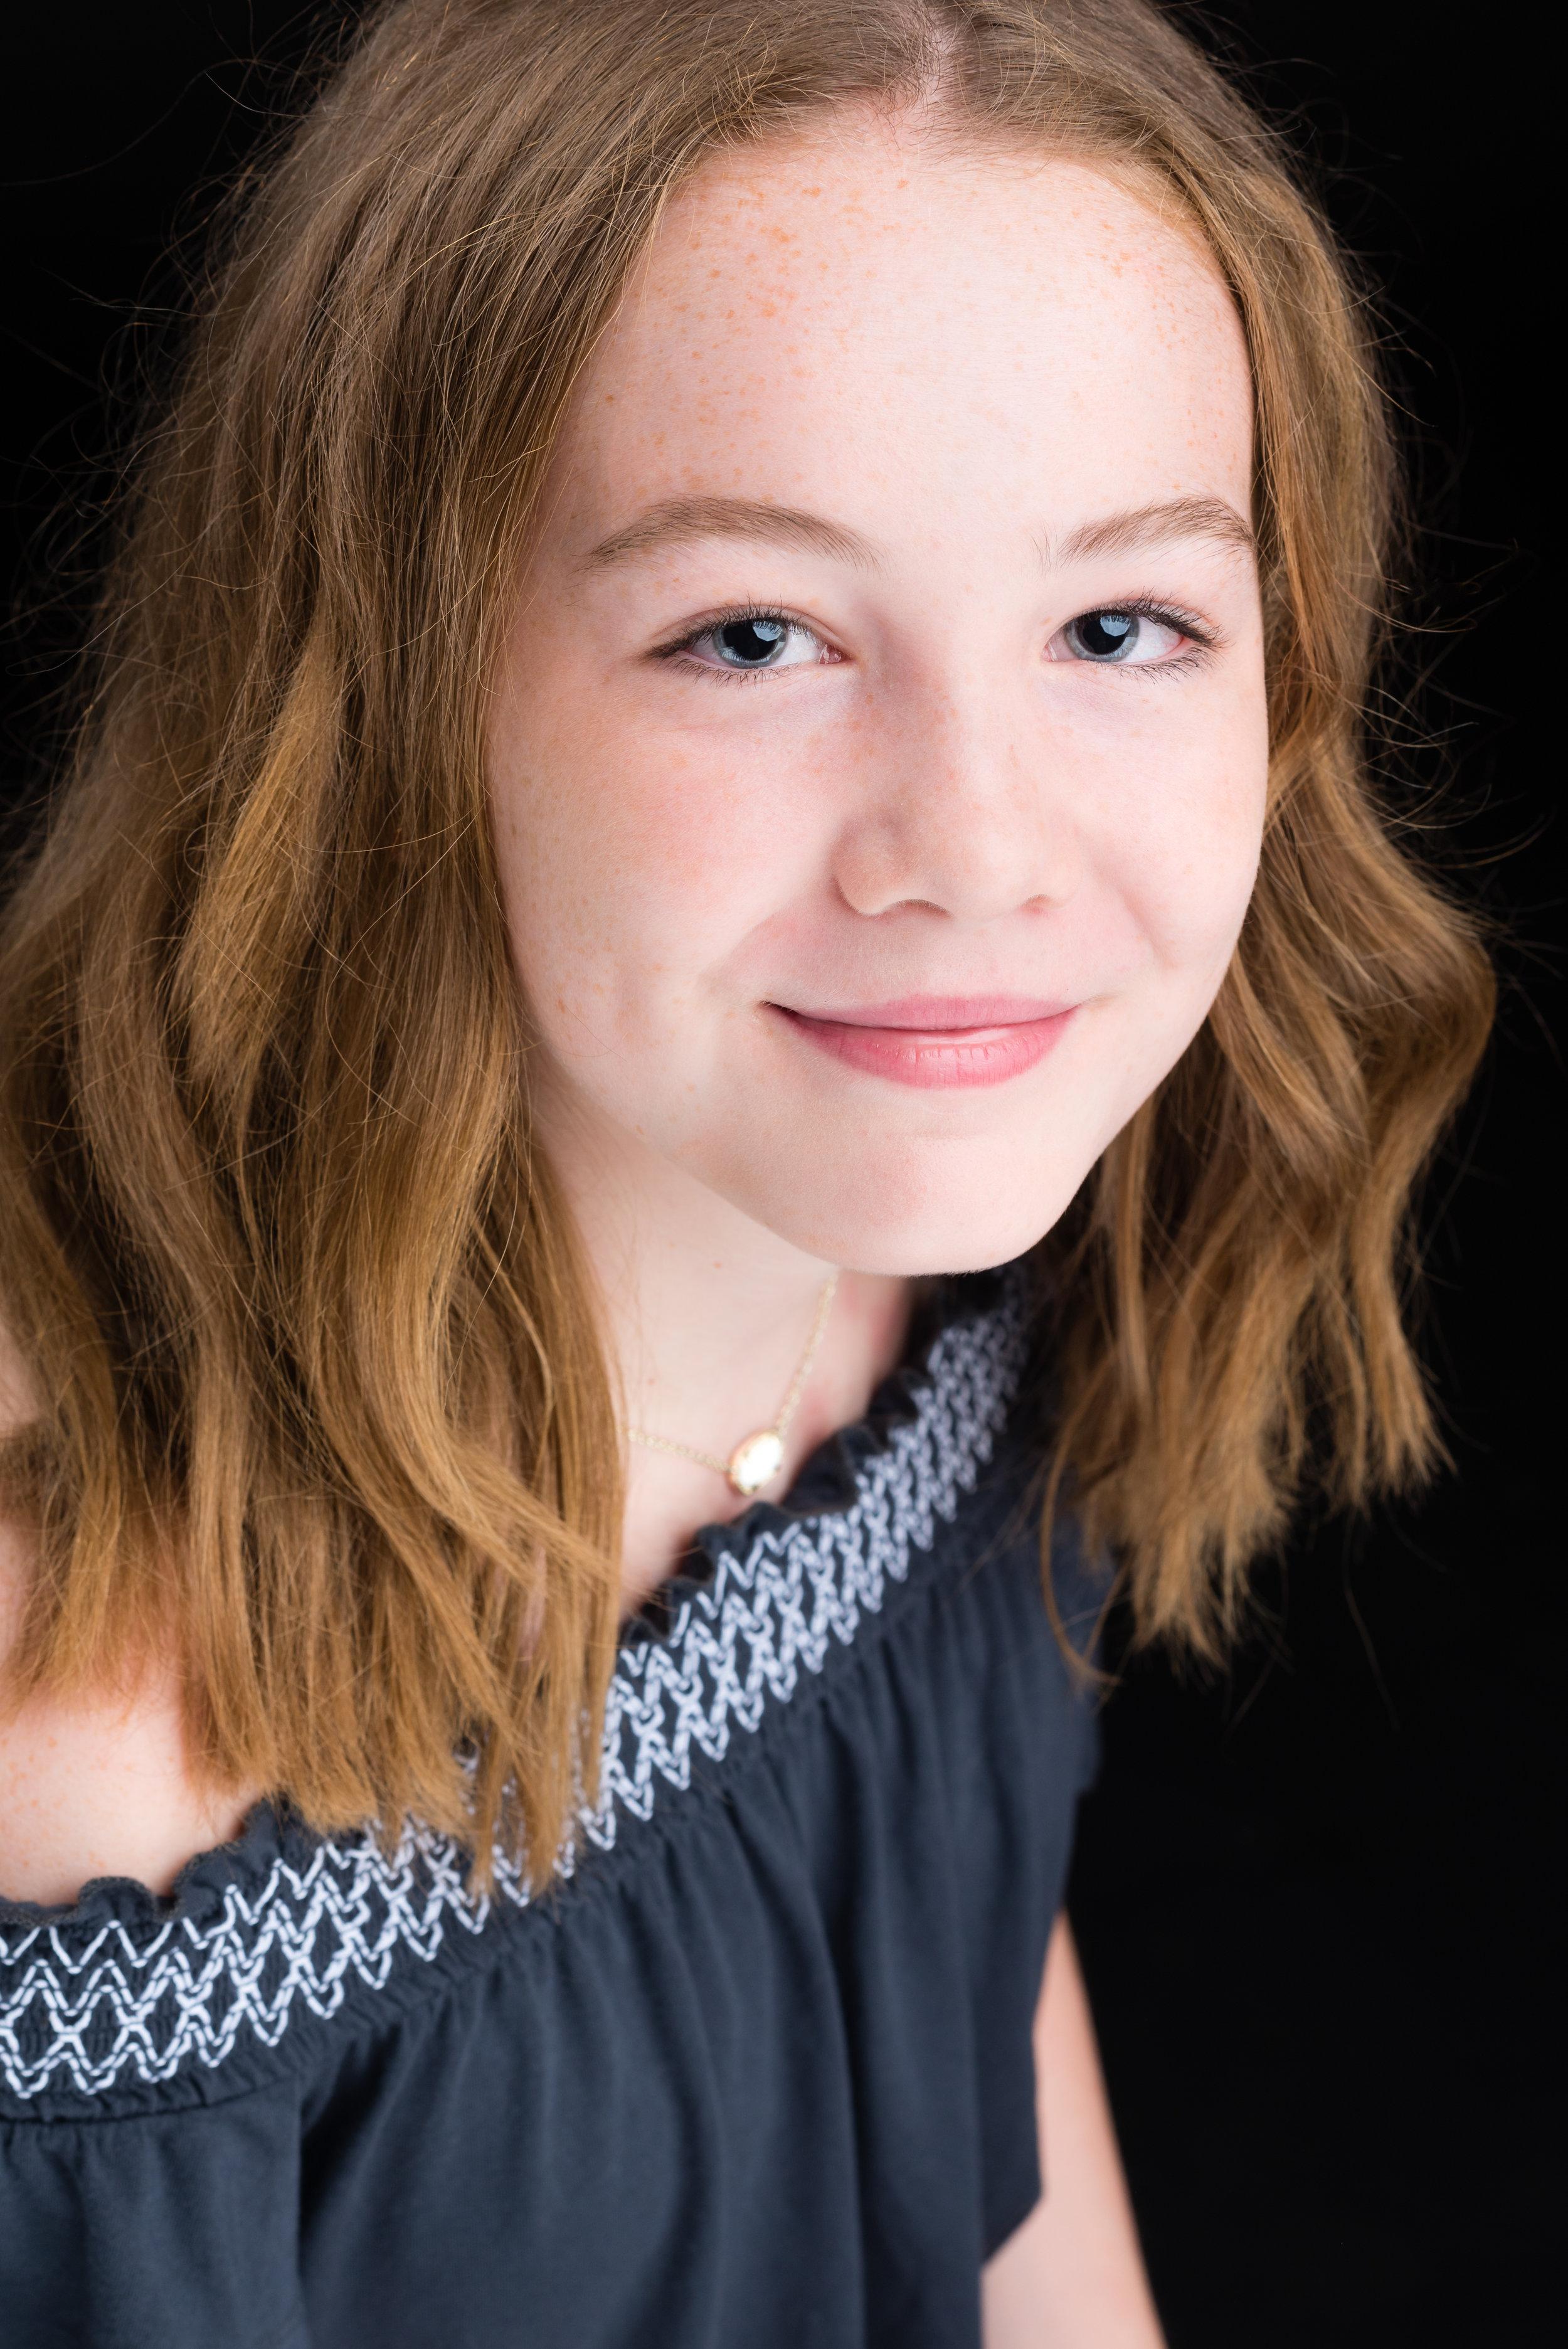 2018_September_03-Leah_Boyle_Portrait_Shoot-50687-Edit.jpg